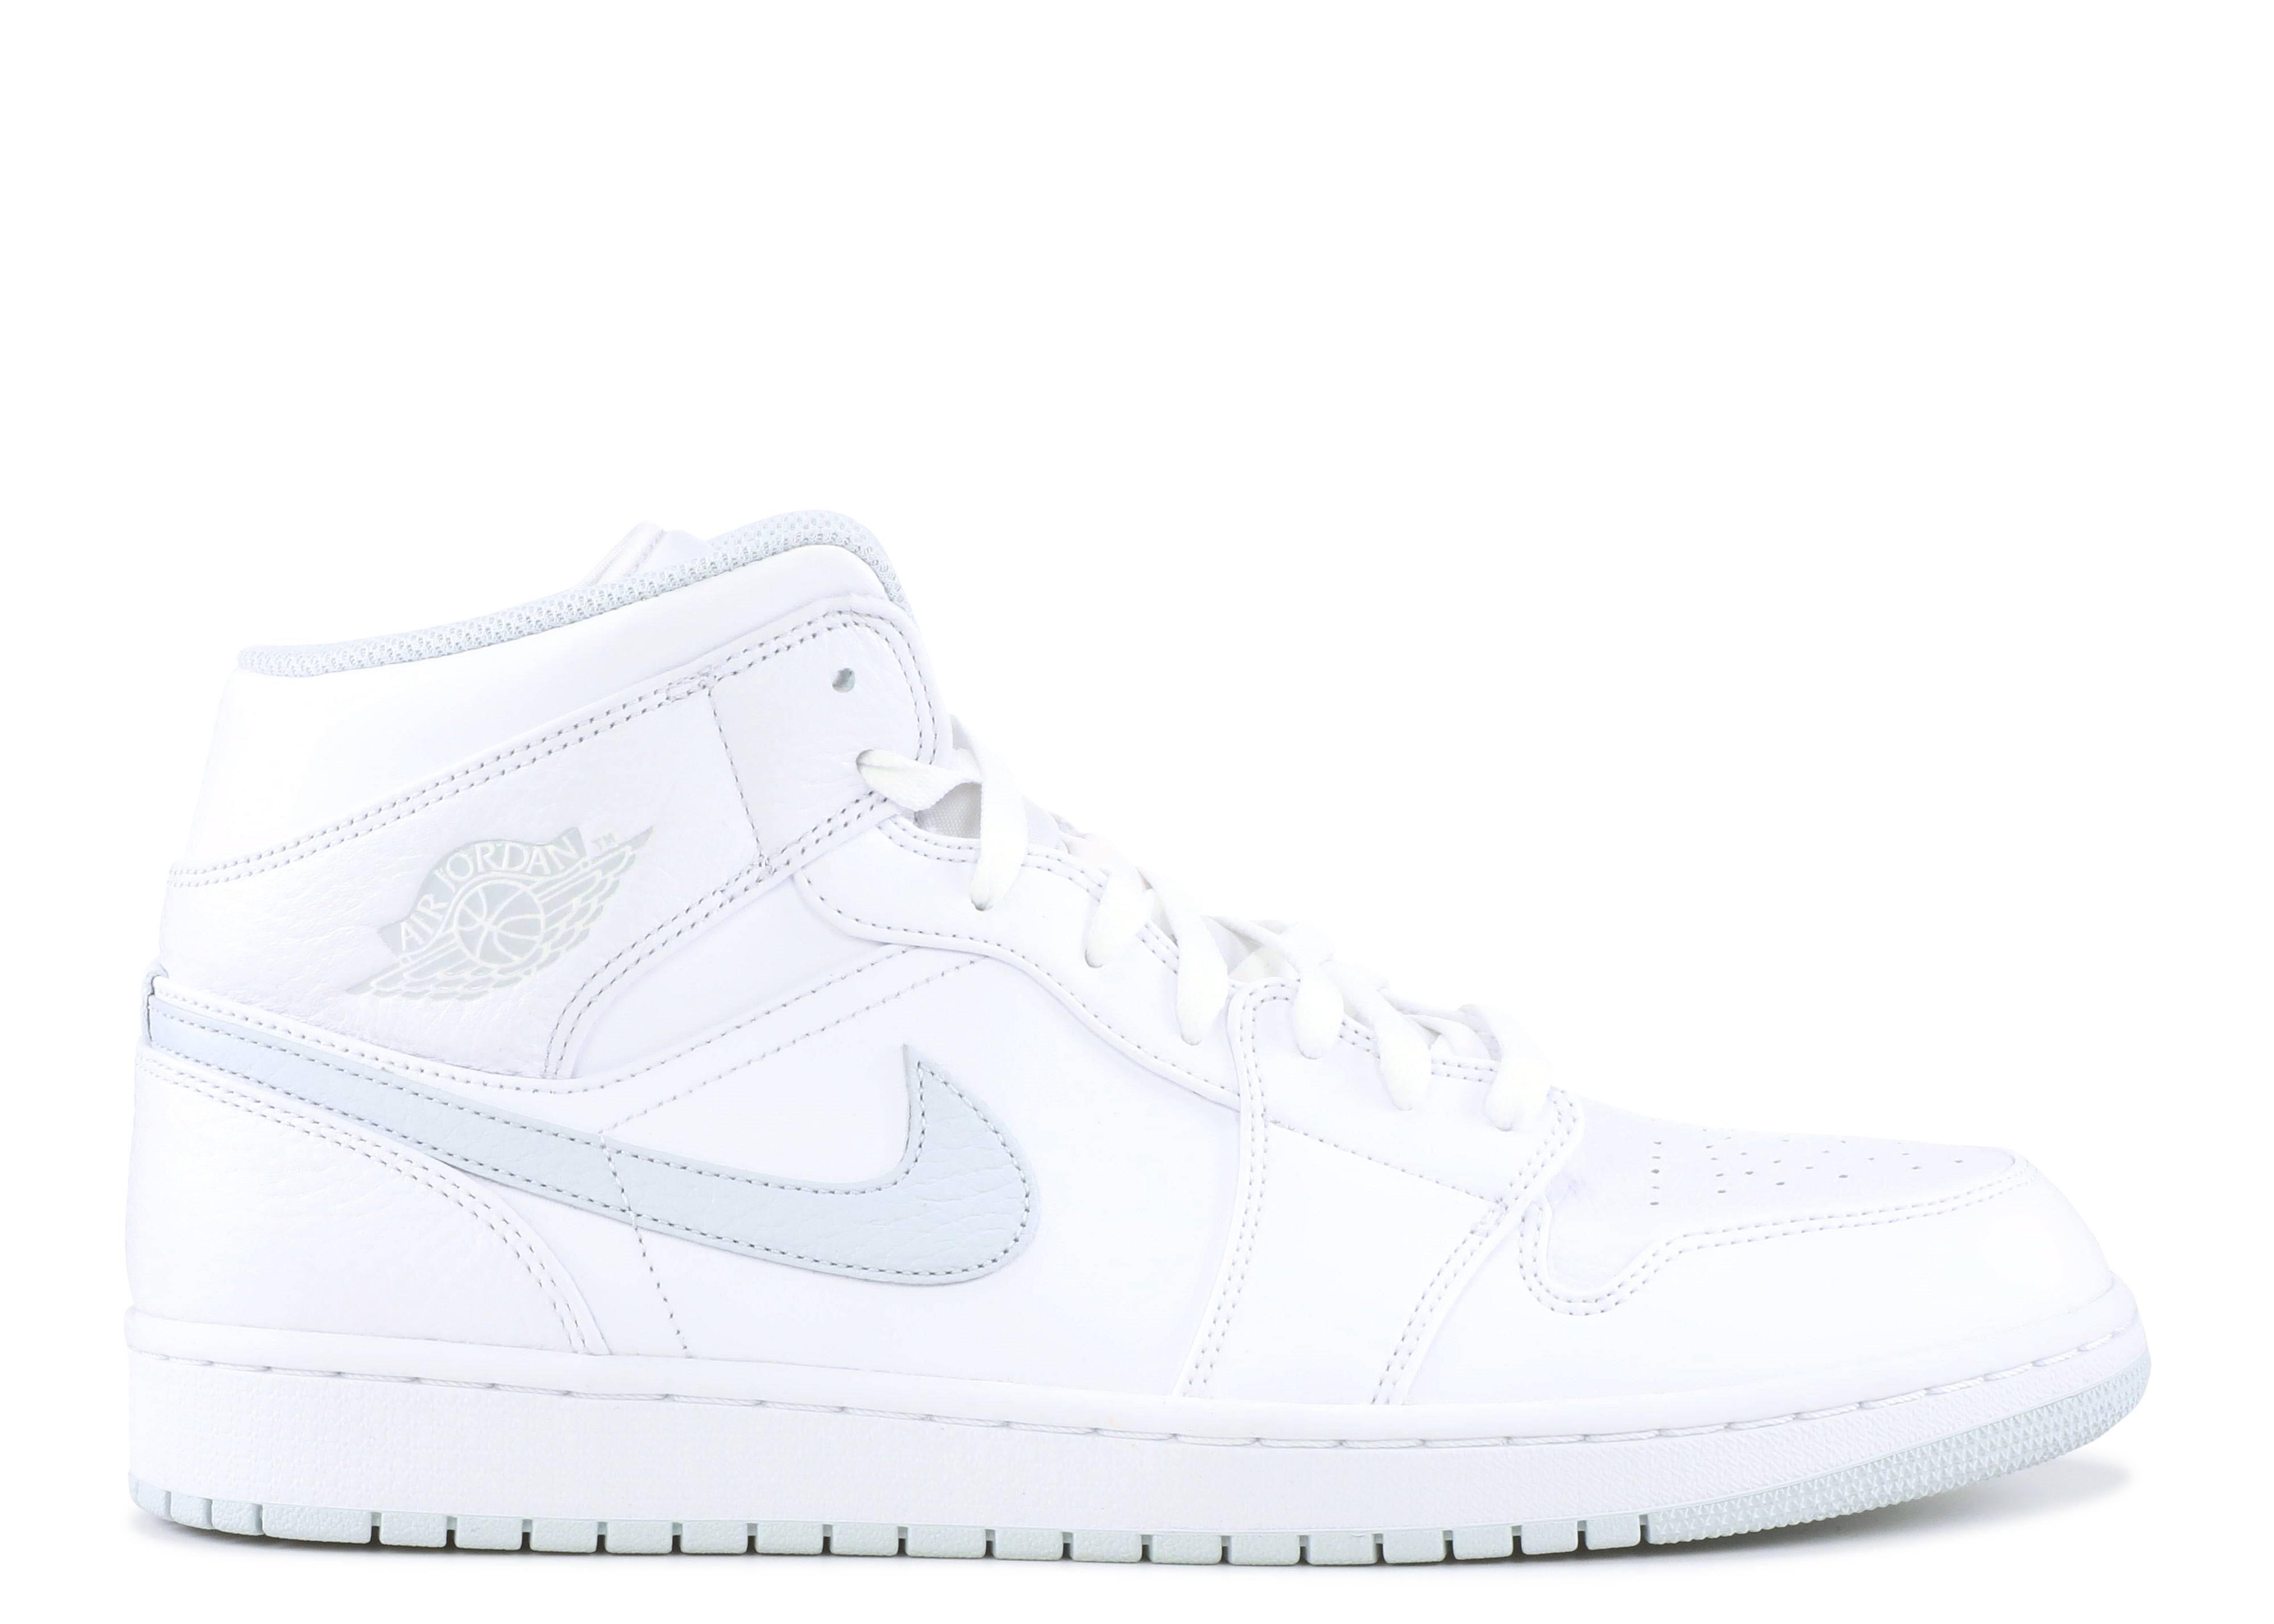 ecc16b90c7f6 554724 108 - Air Jordan - 554724 108 - white pure platinum-white ...